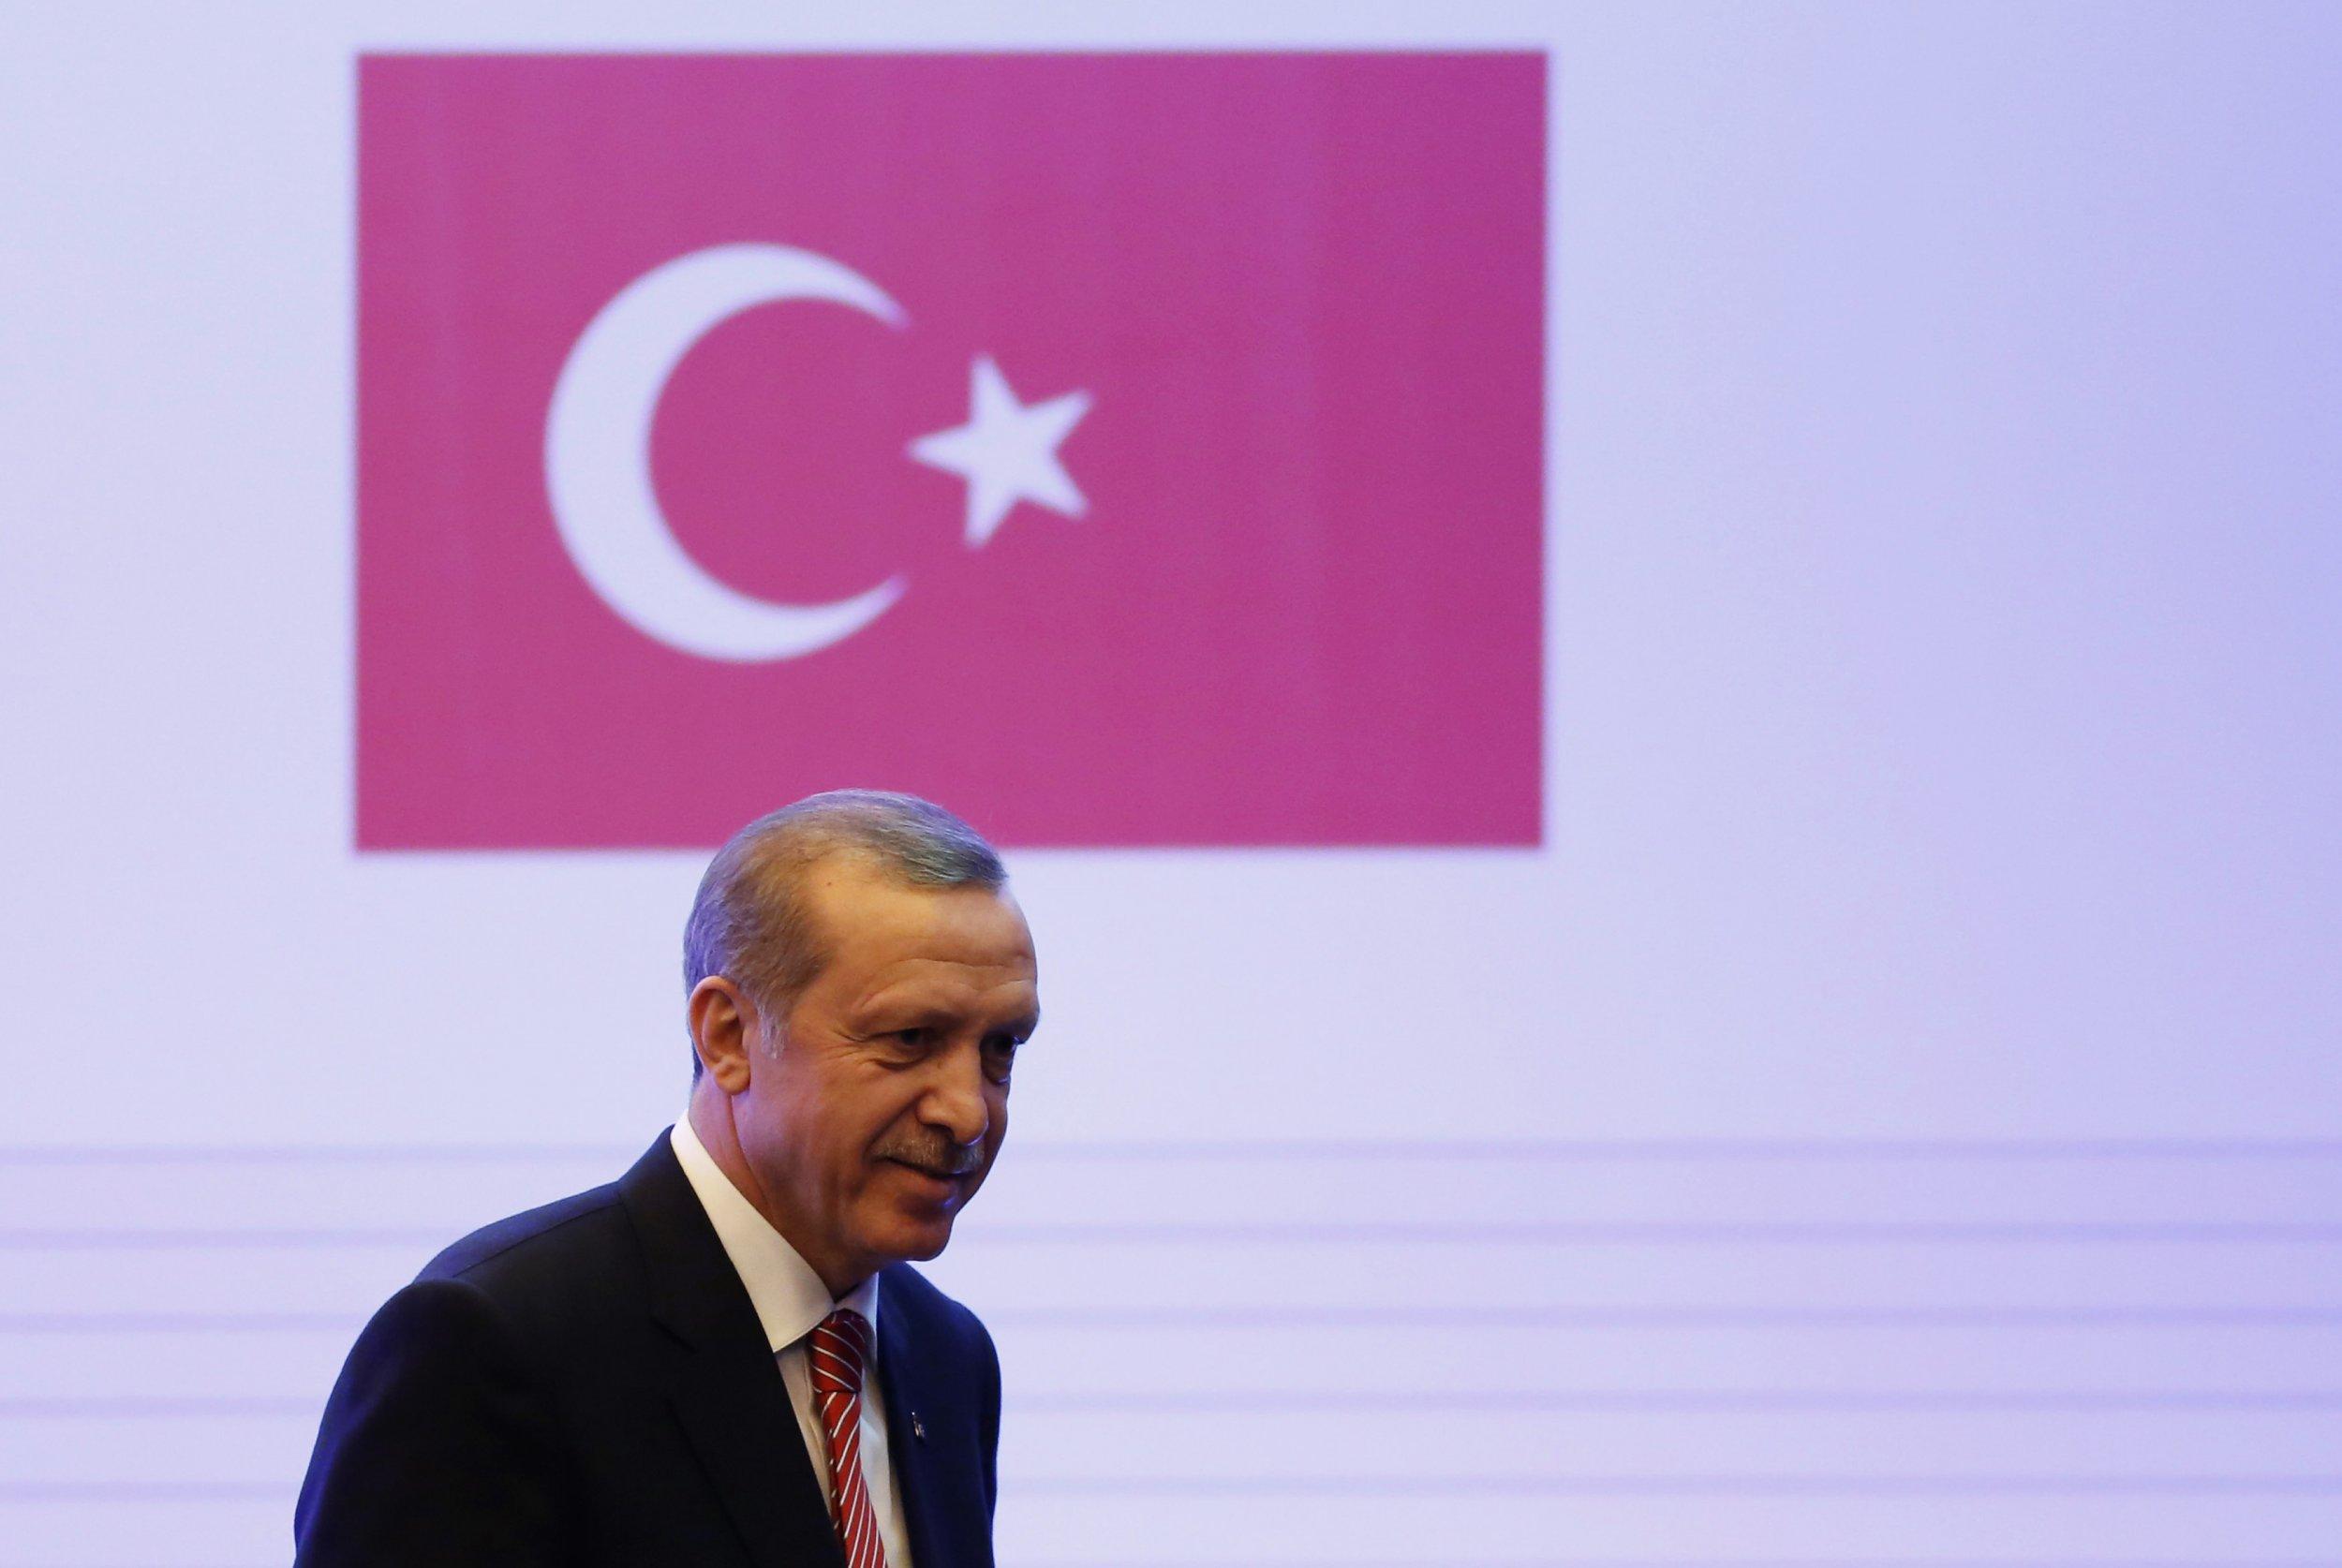 Turkey Blocks Twitter